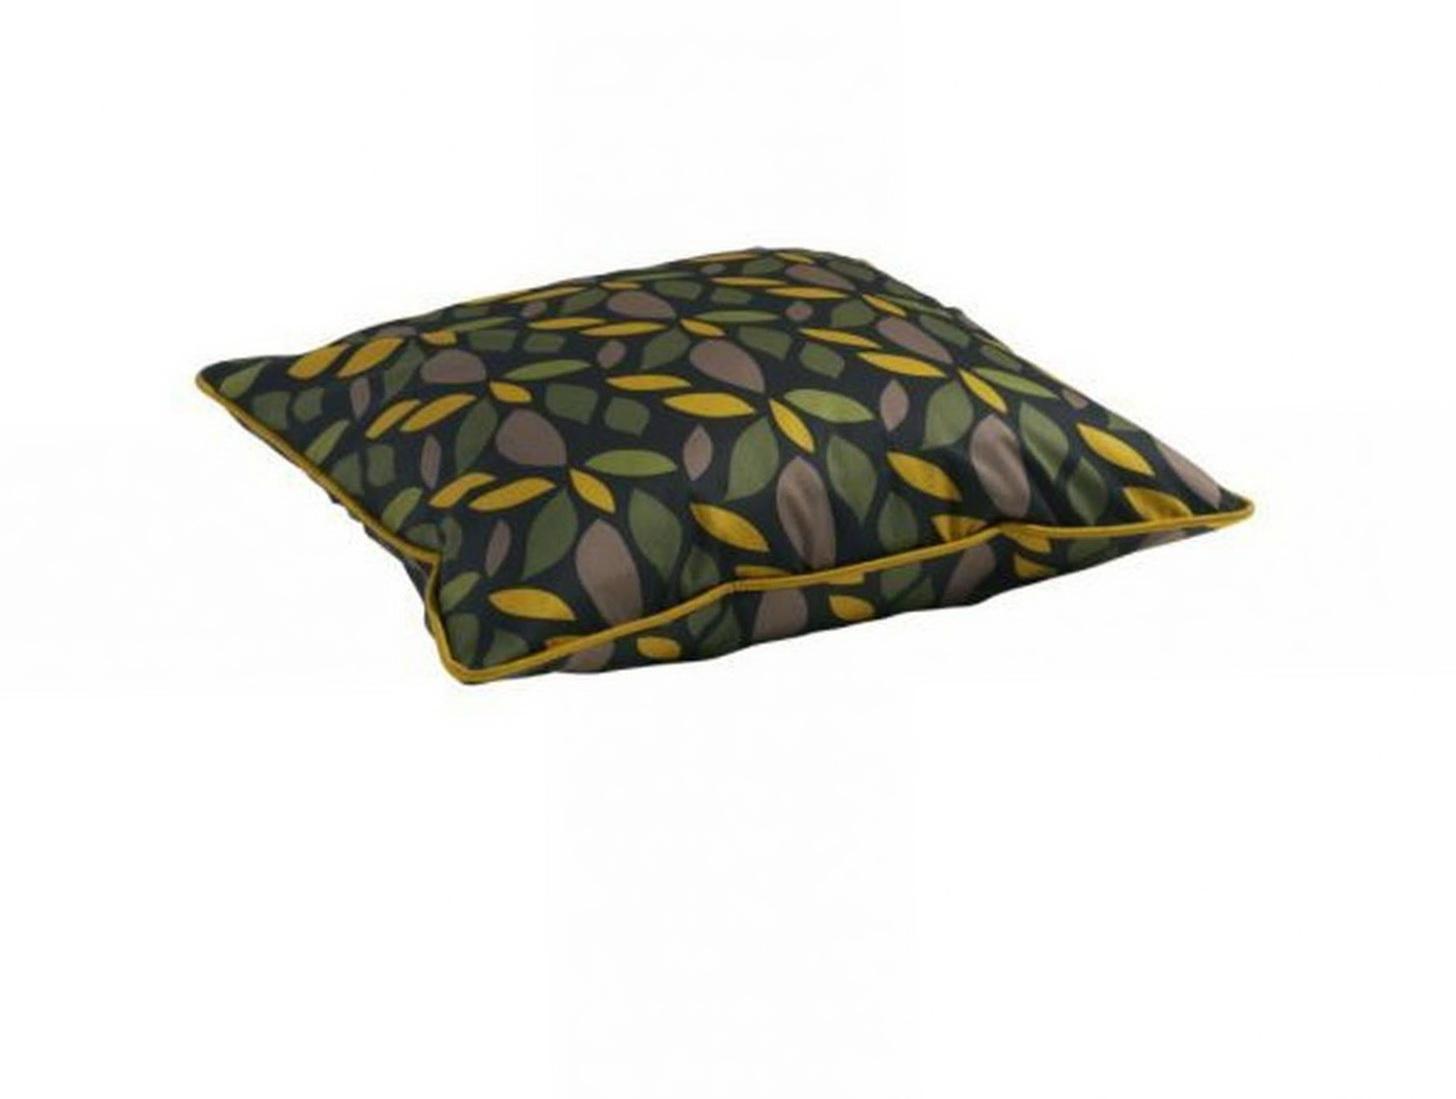 Ikea Cushion Covers 65 X 65